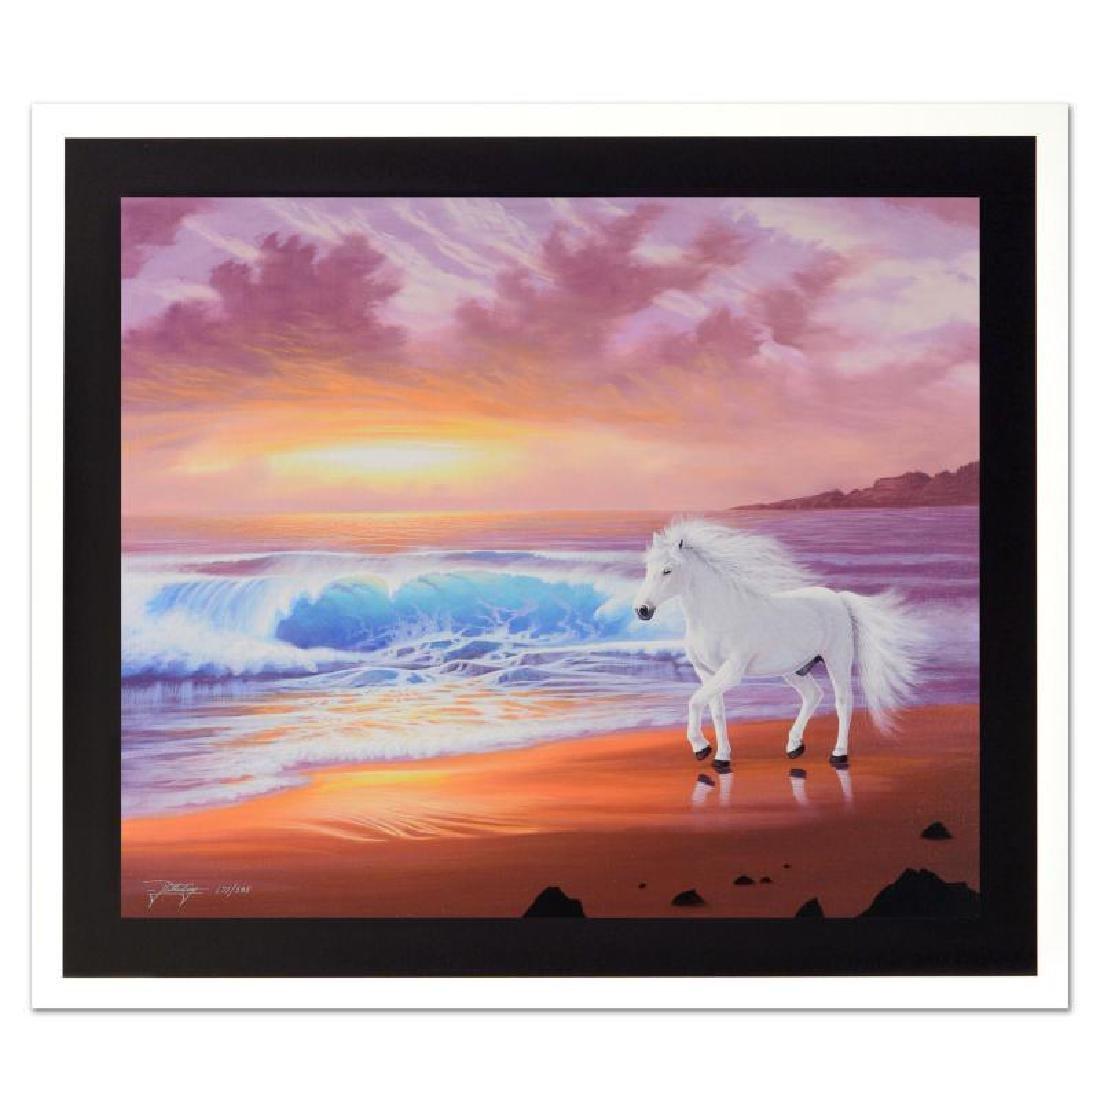 "Jon Rattenbury - ""Shores of Grace"" Limited Edition"